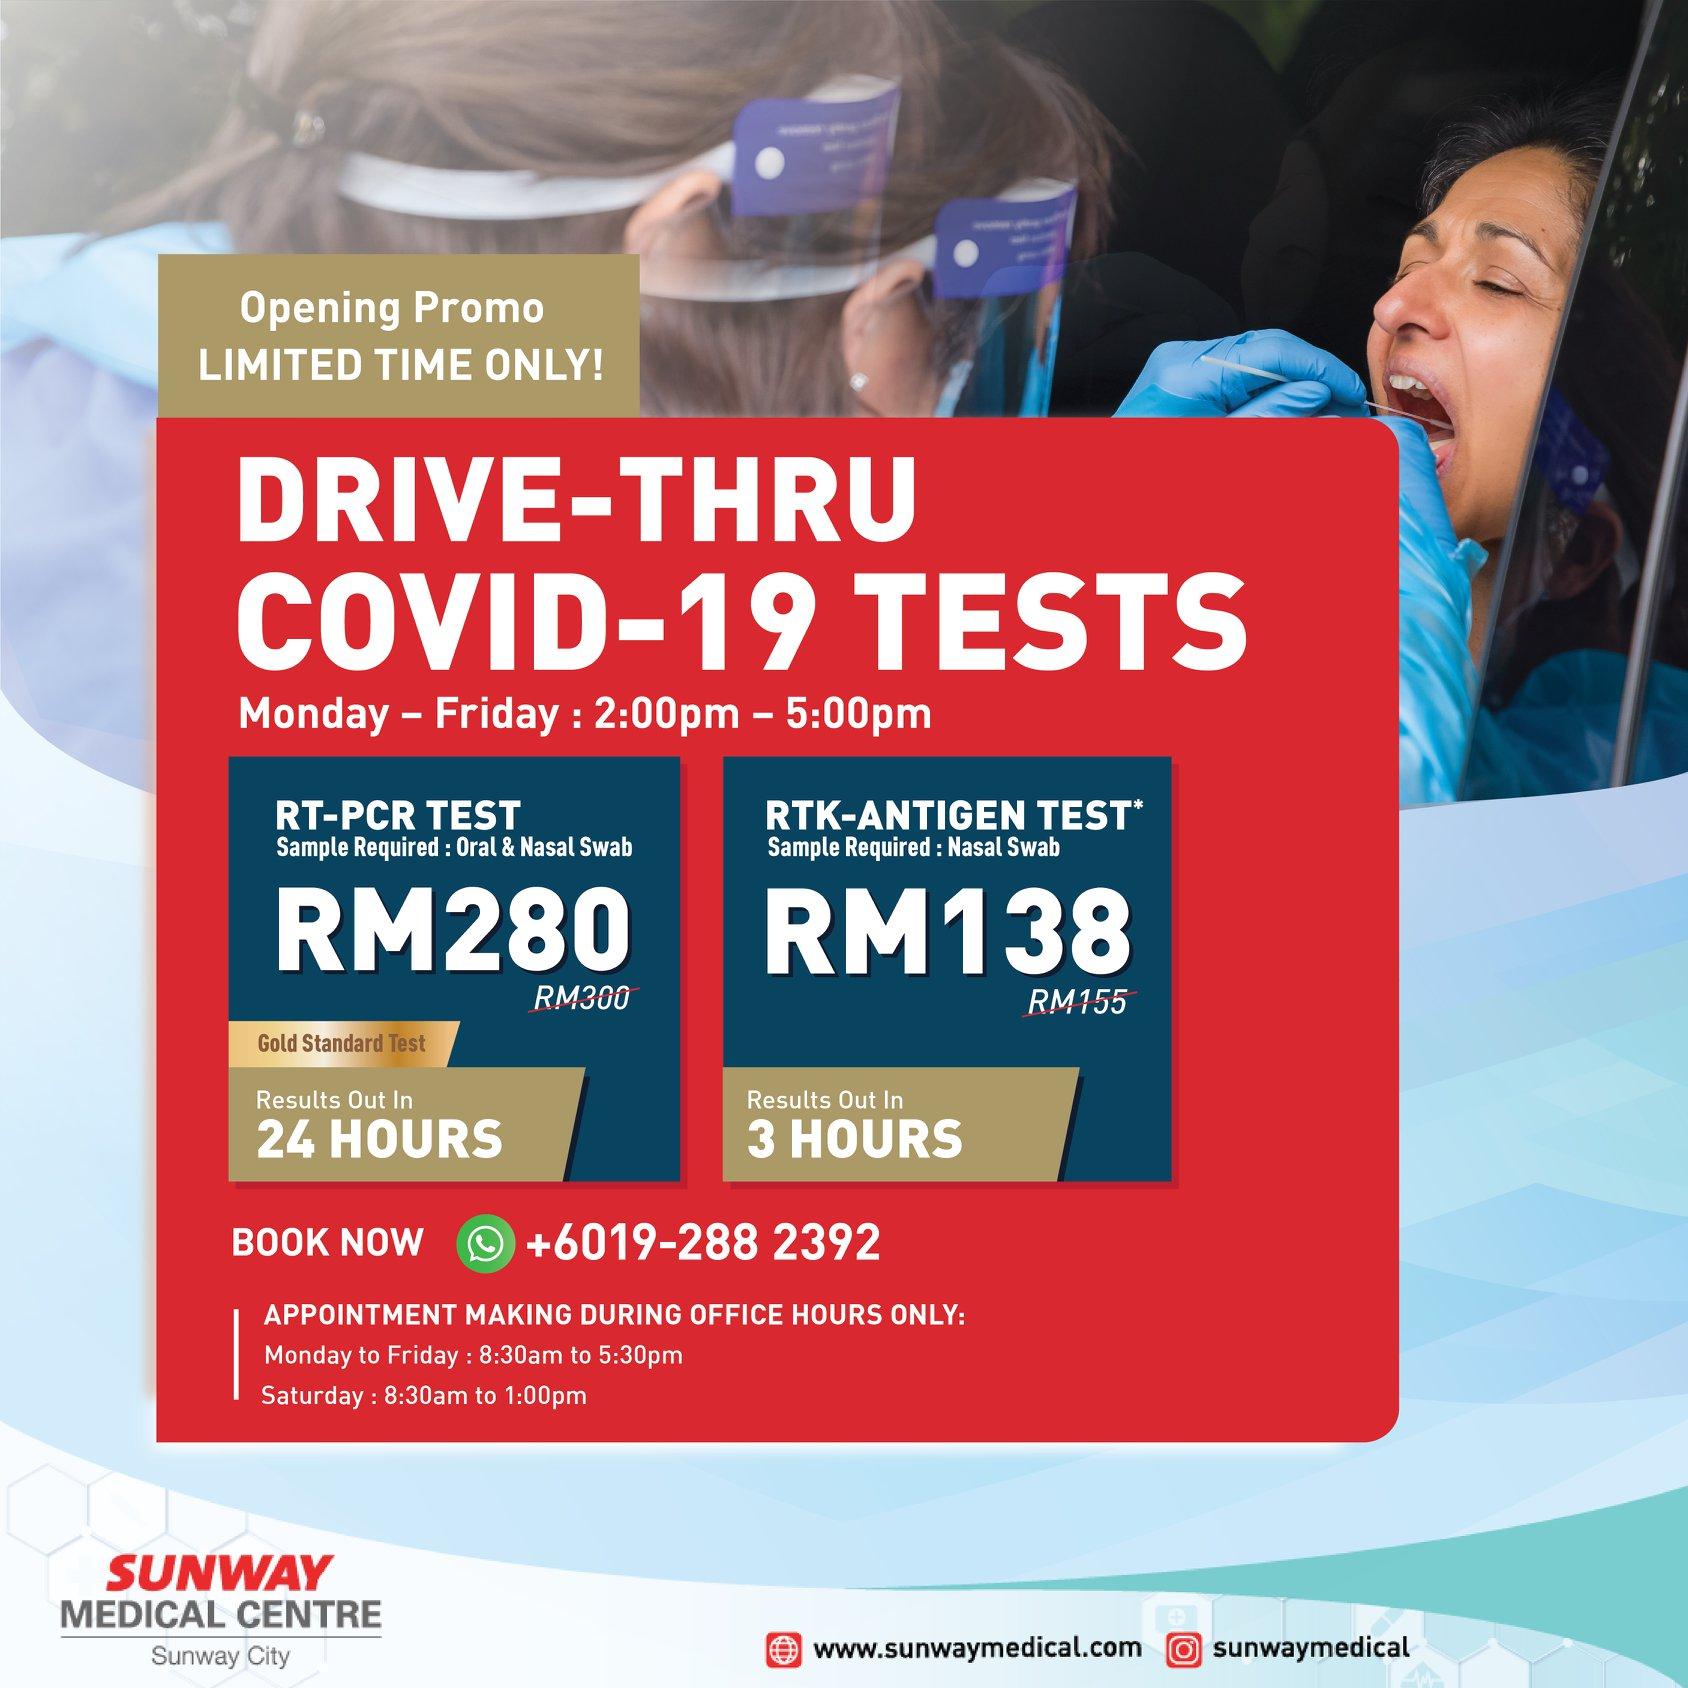 Drive Thru COVID-19 Tests